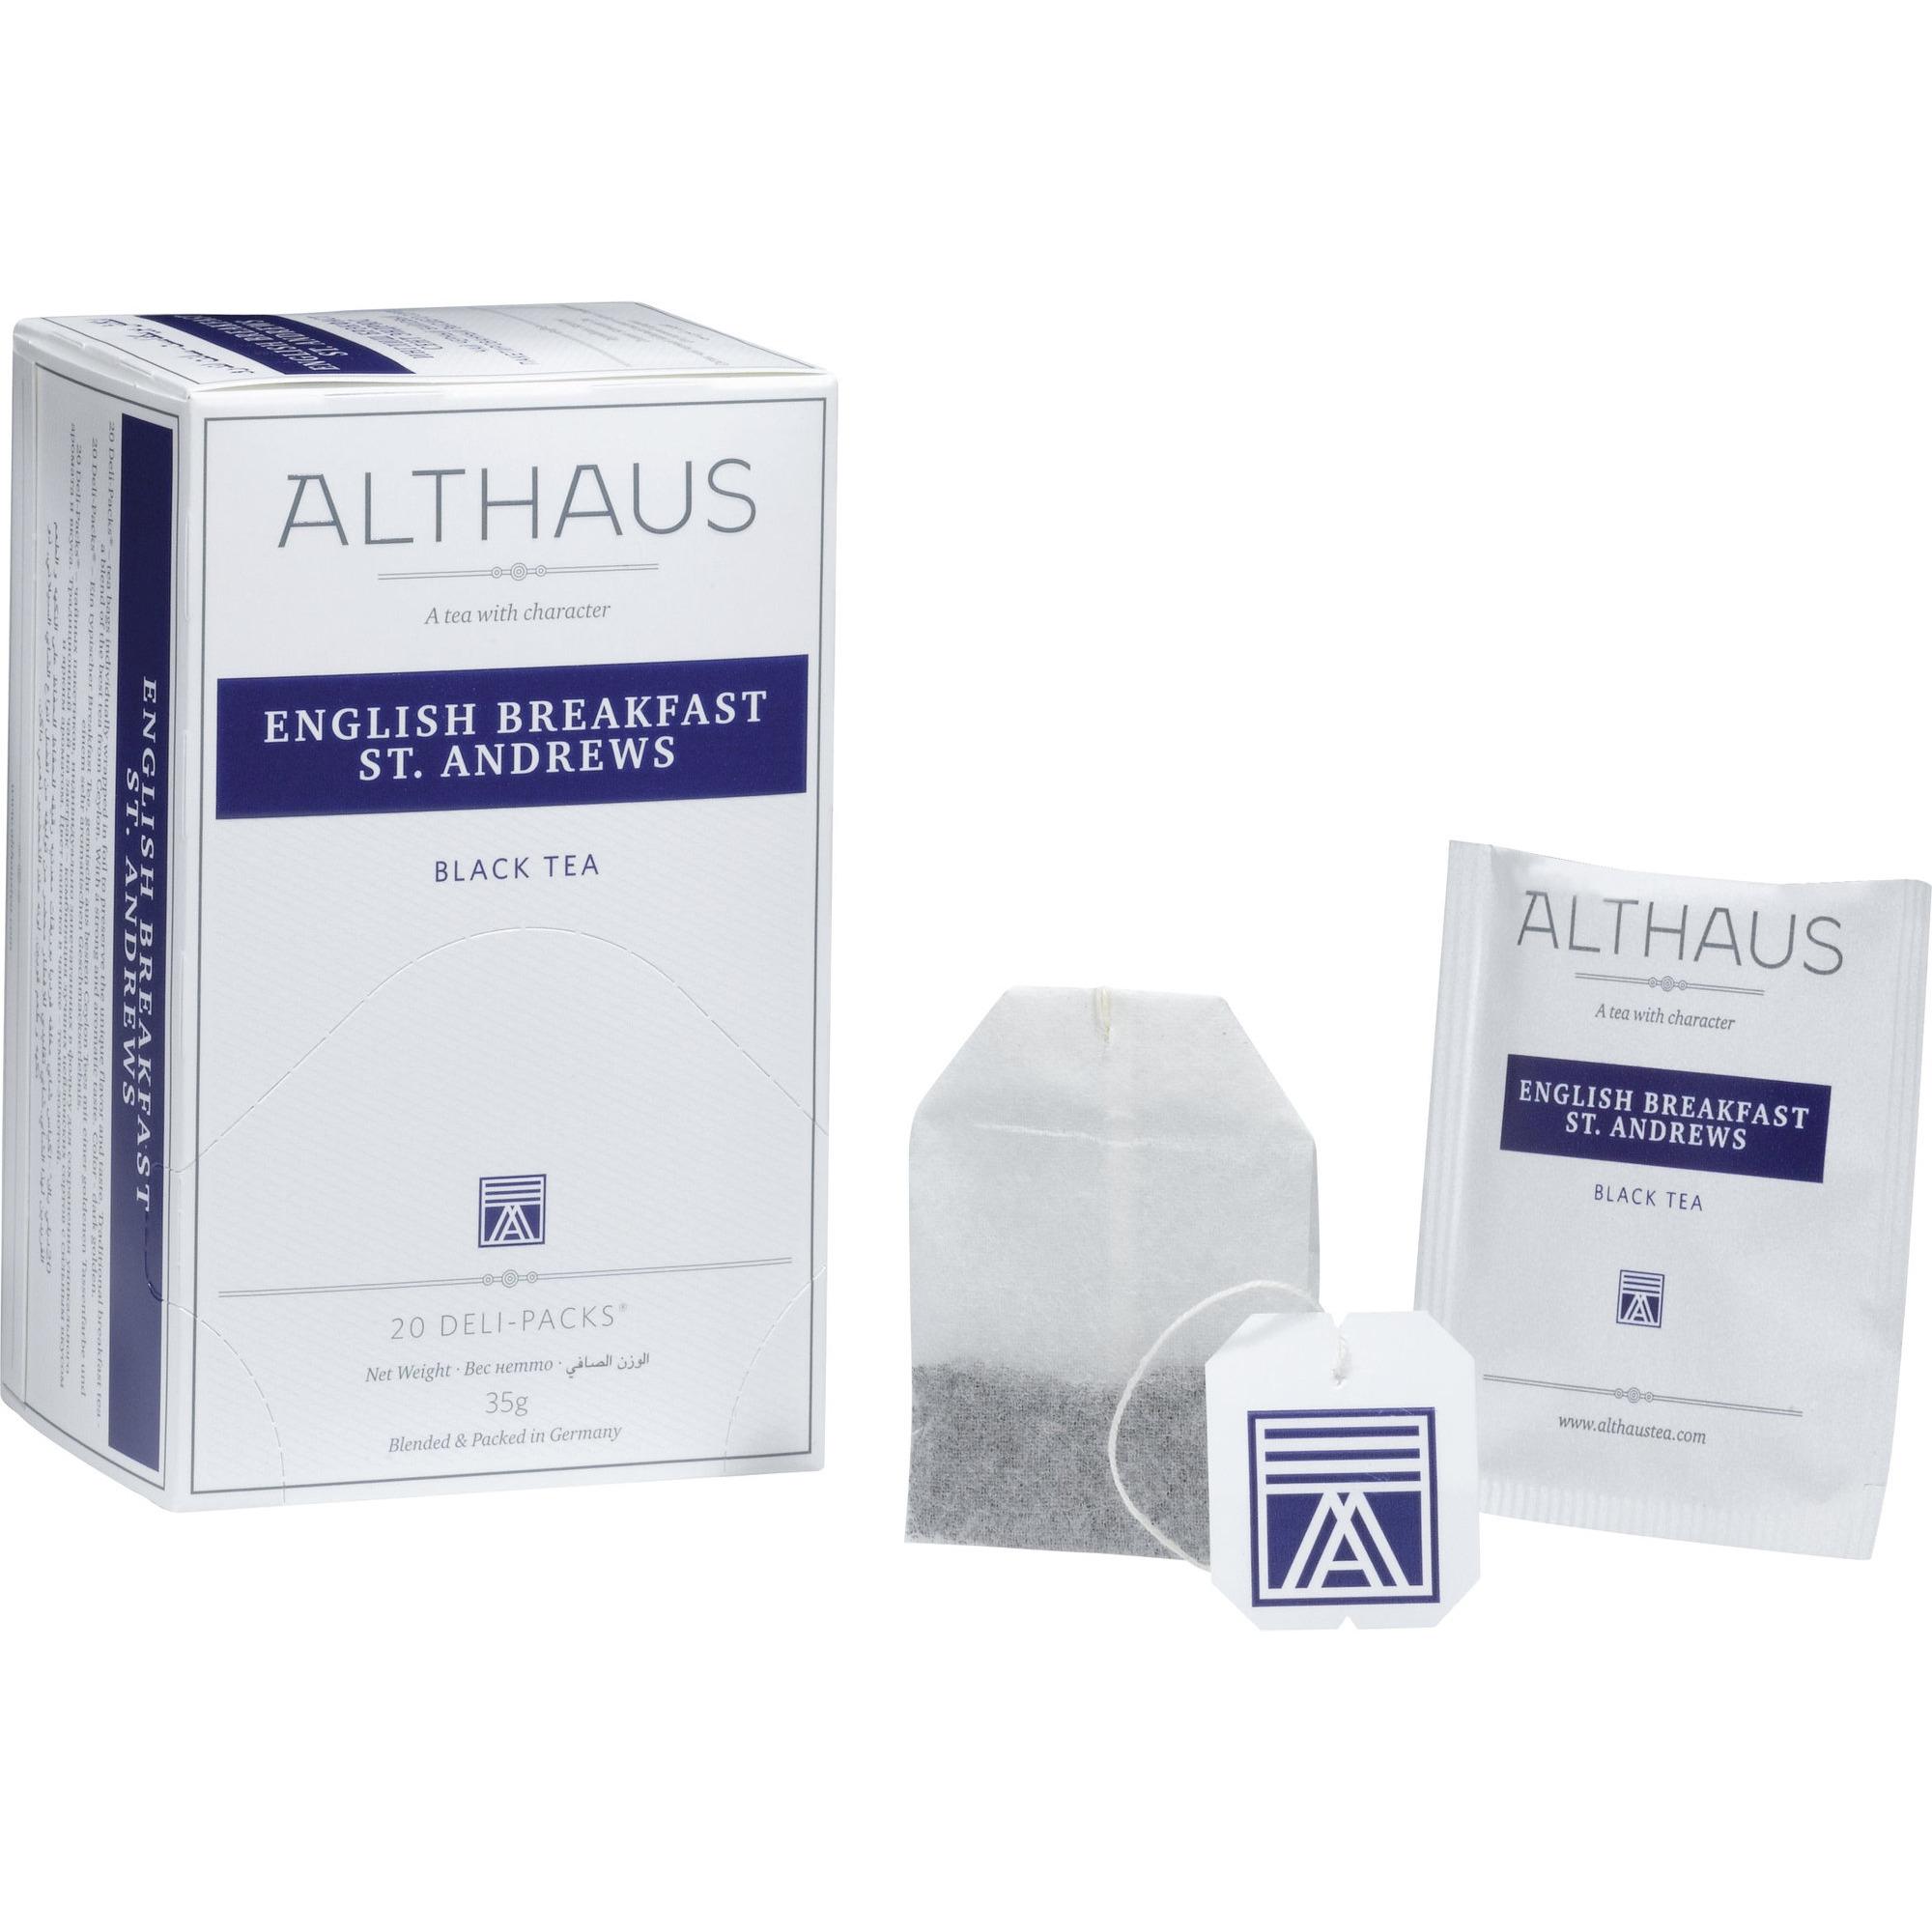 Bilde av Althaus 20 Stk. English Breakfast Te